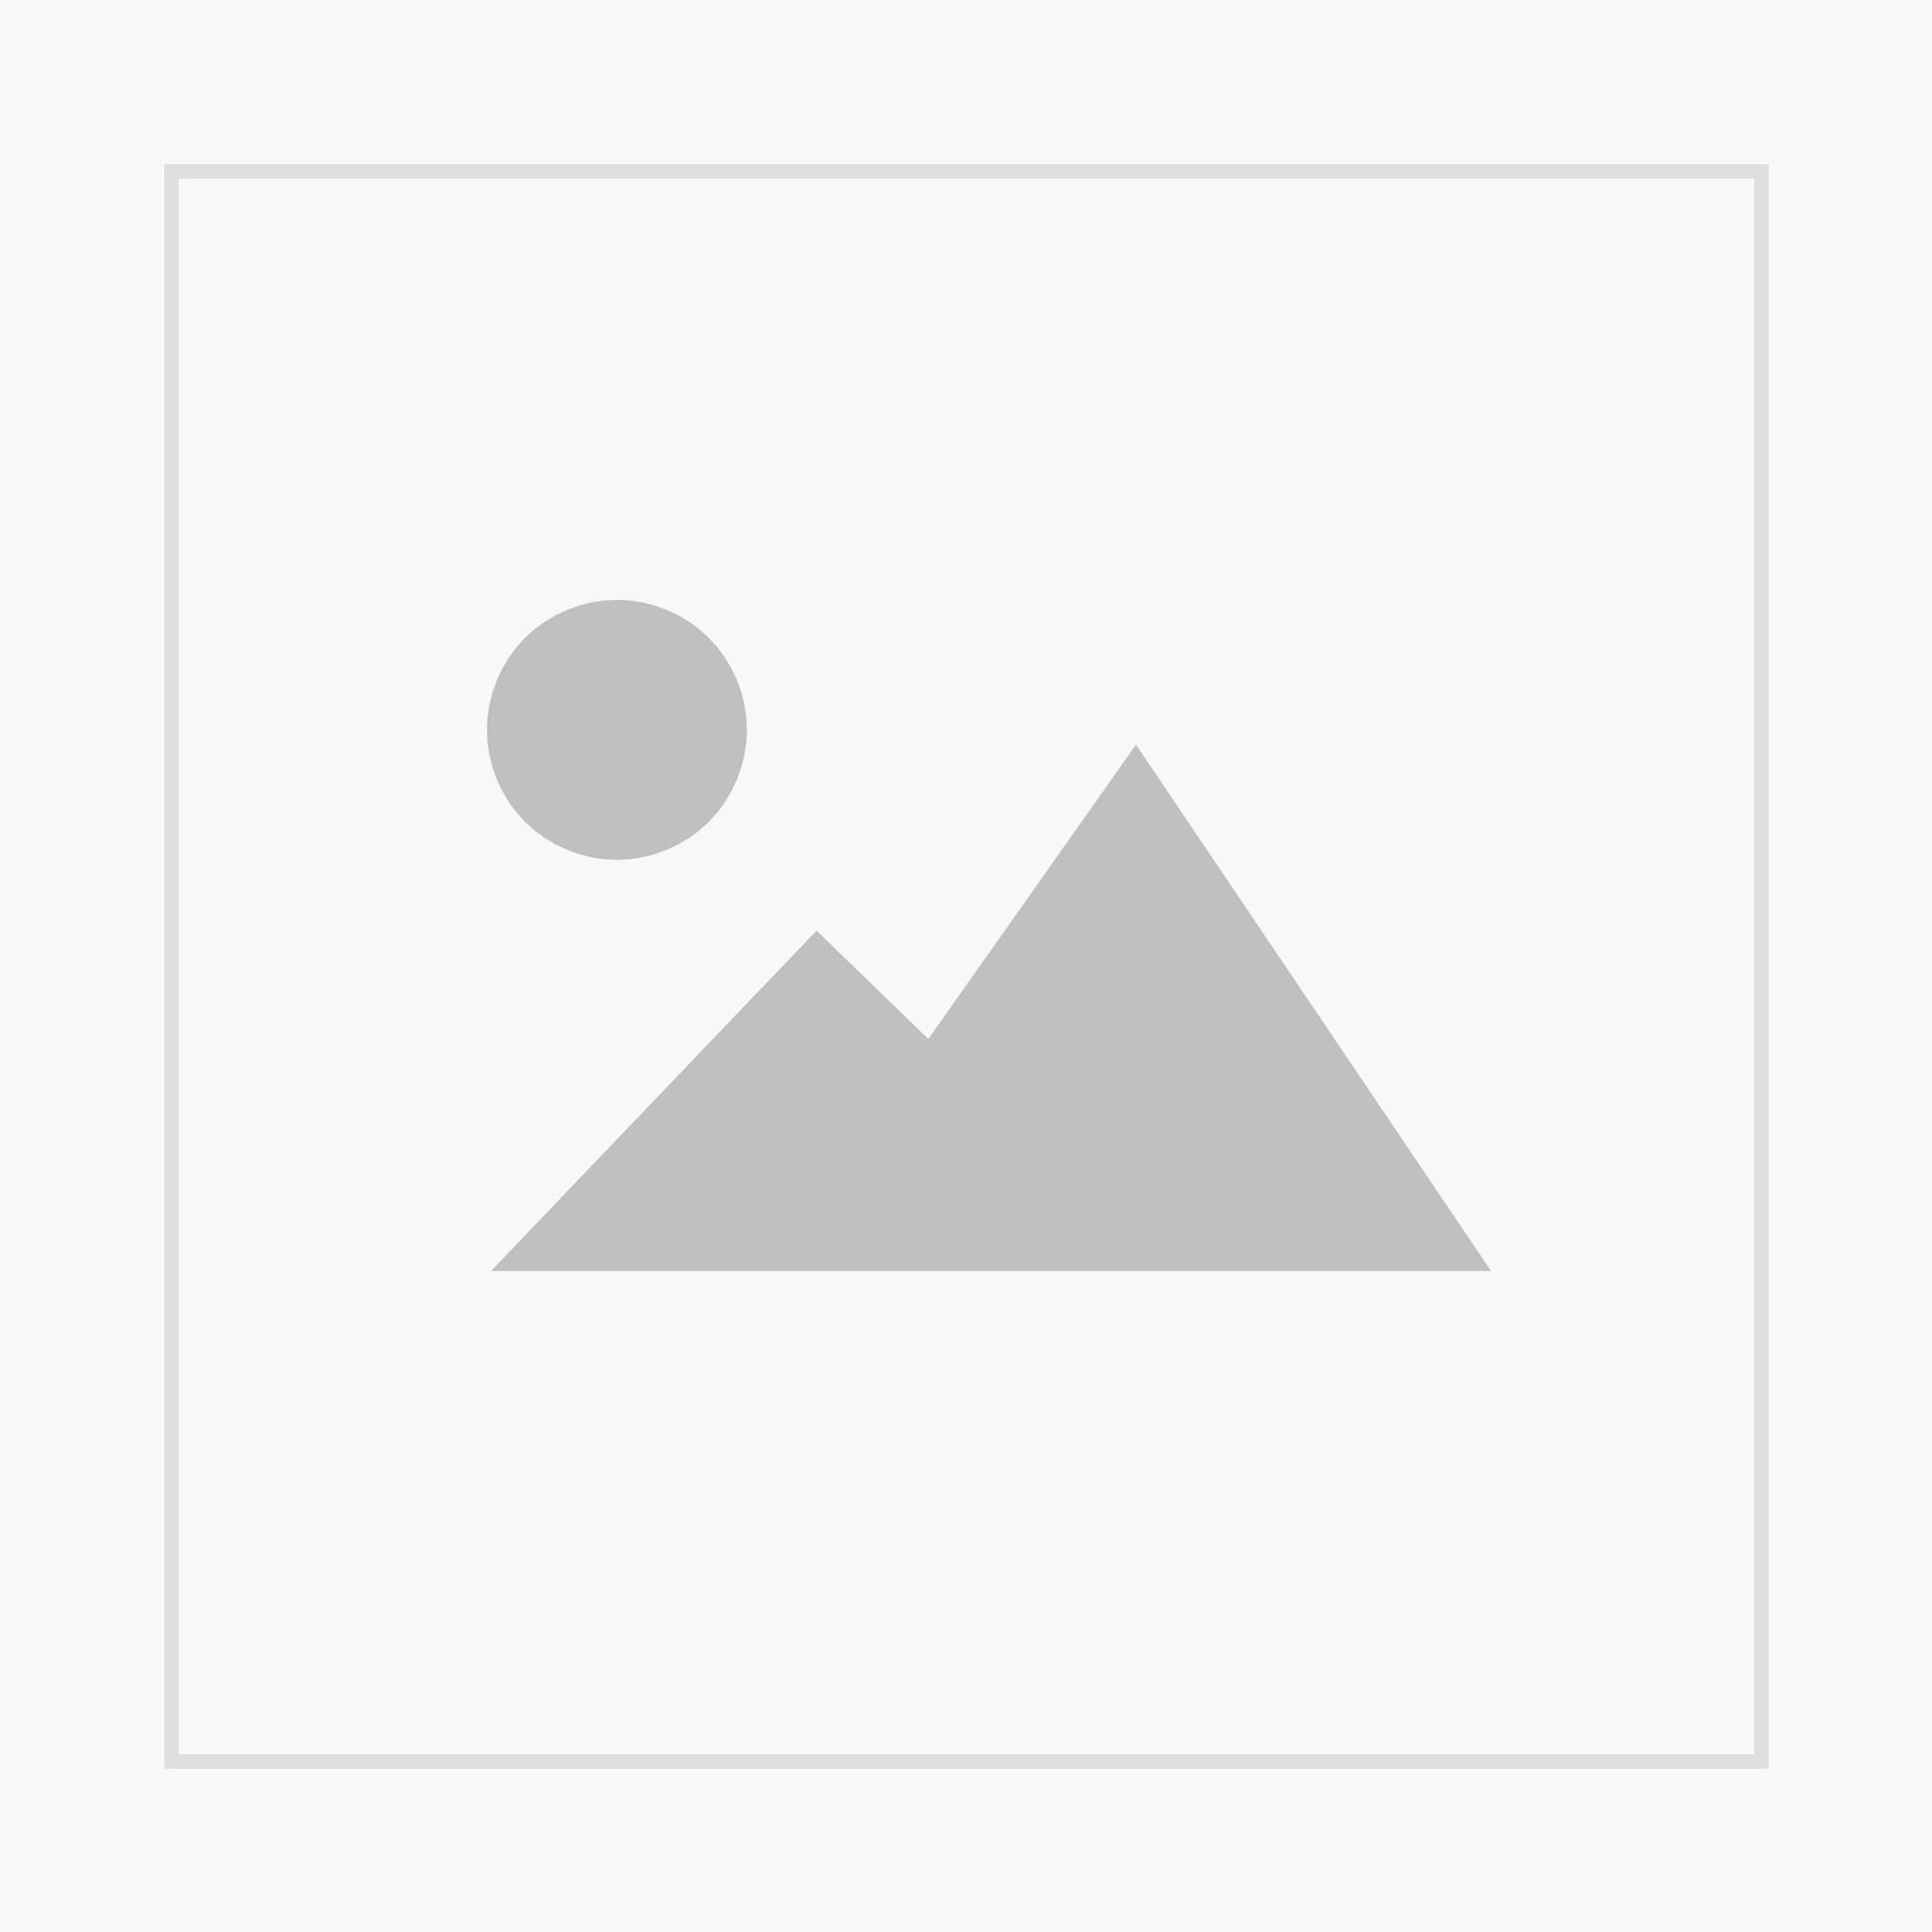 NaBiV Heft 3: European Instruments of Environmental Protection